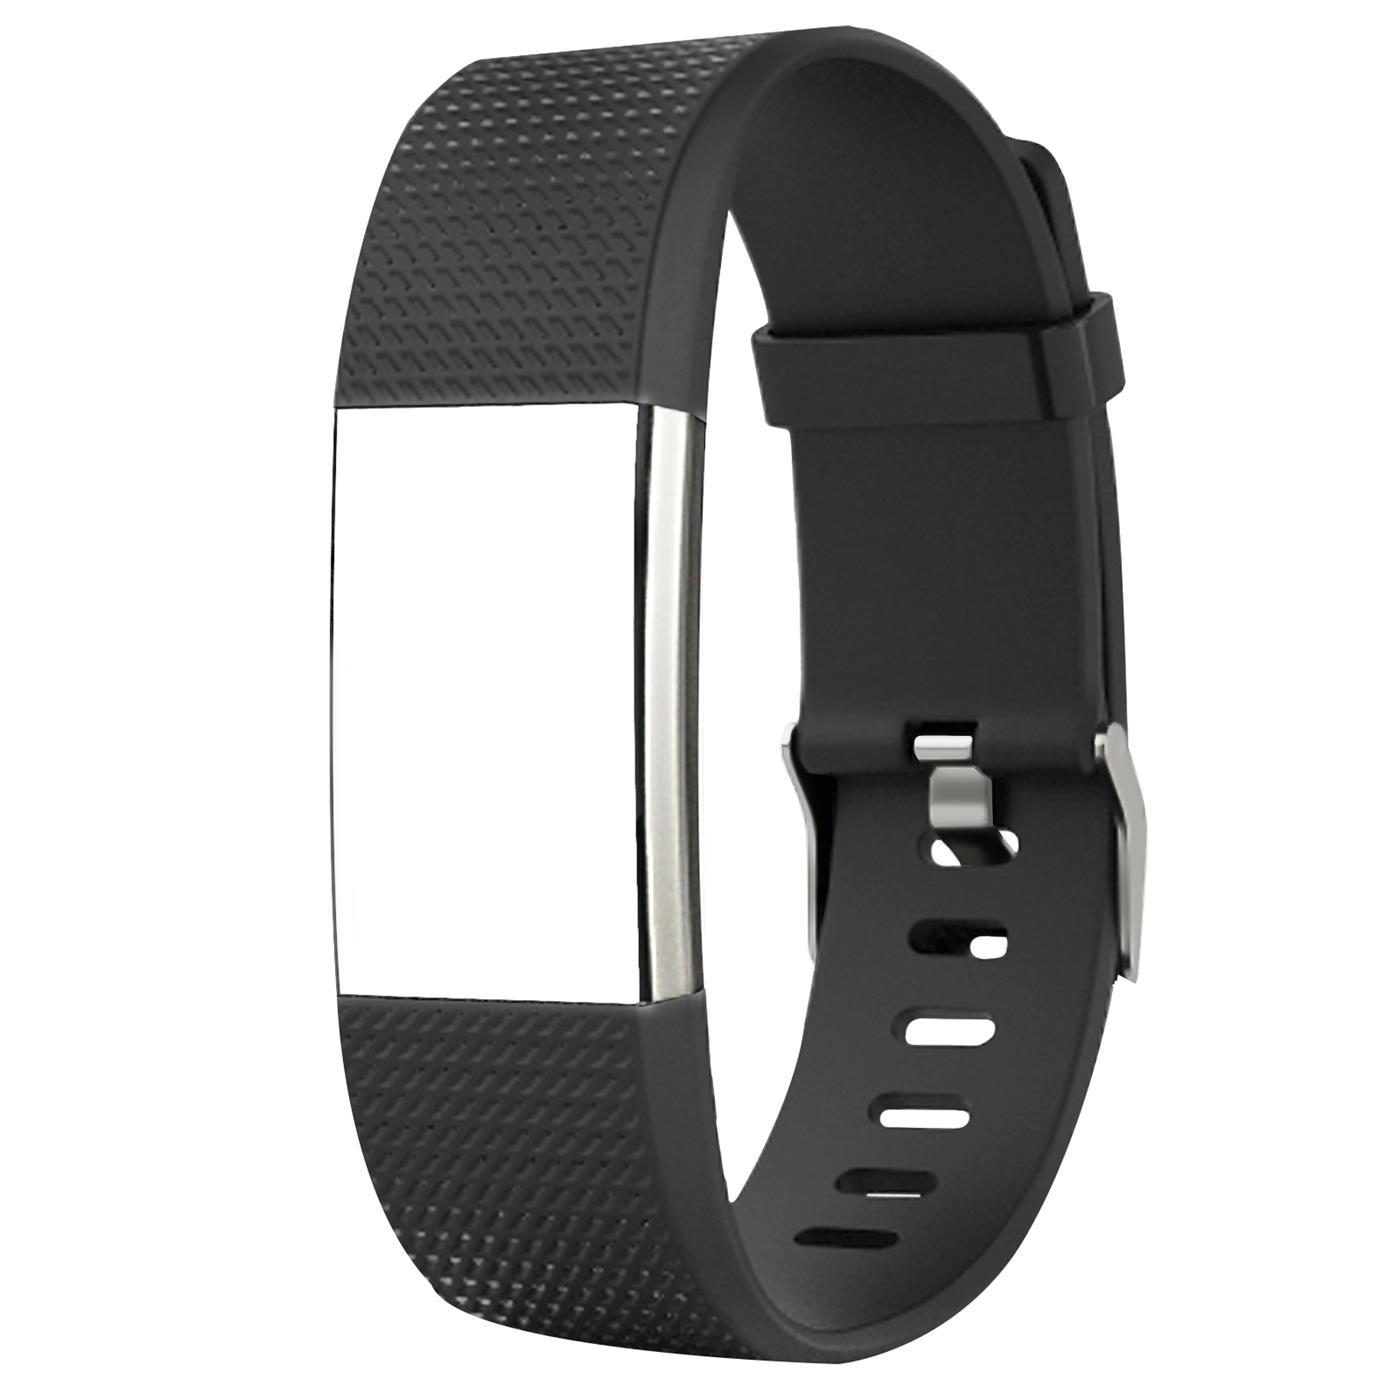 Fitbit-Groesse-S-oder-L-Ersatz-Silikon-Armband-Uhren-Sport-Band-Fitness-Tracker Indexbild 17